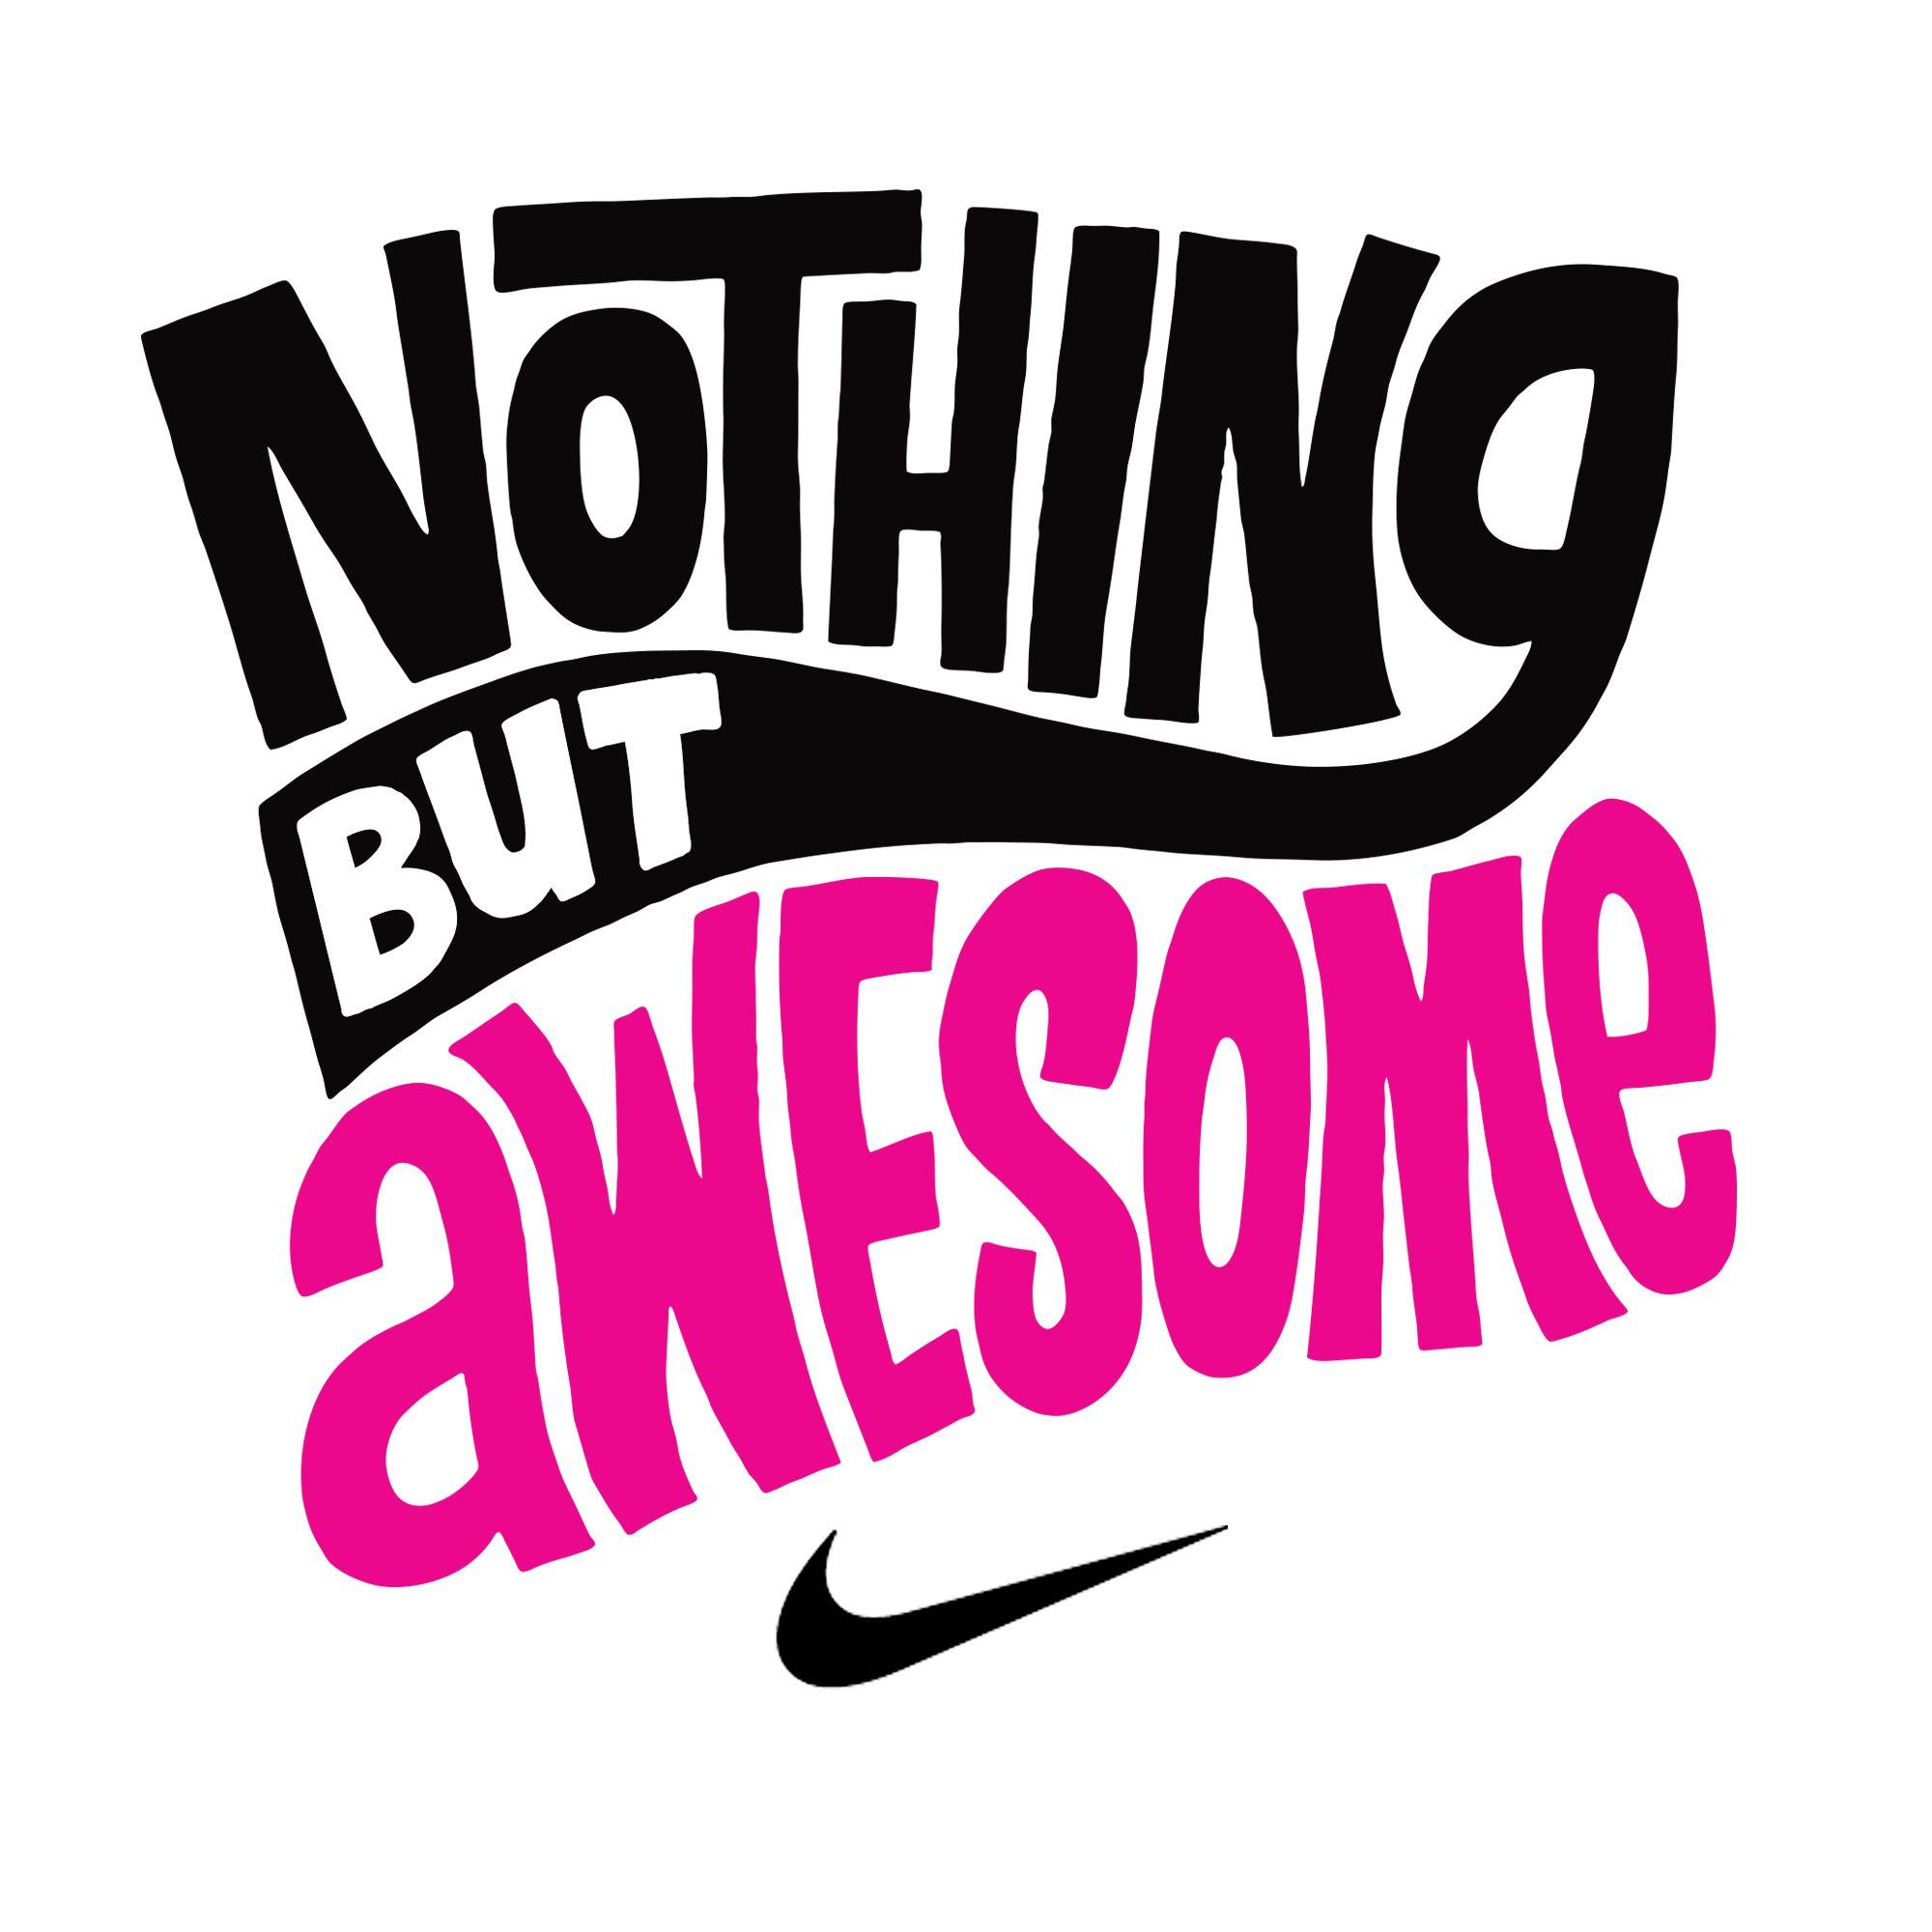 Nike Apparel Chris Piascik Nike outfits, Types of